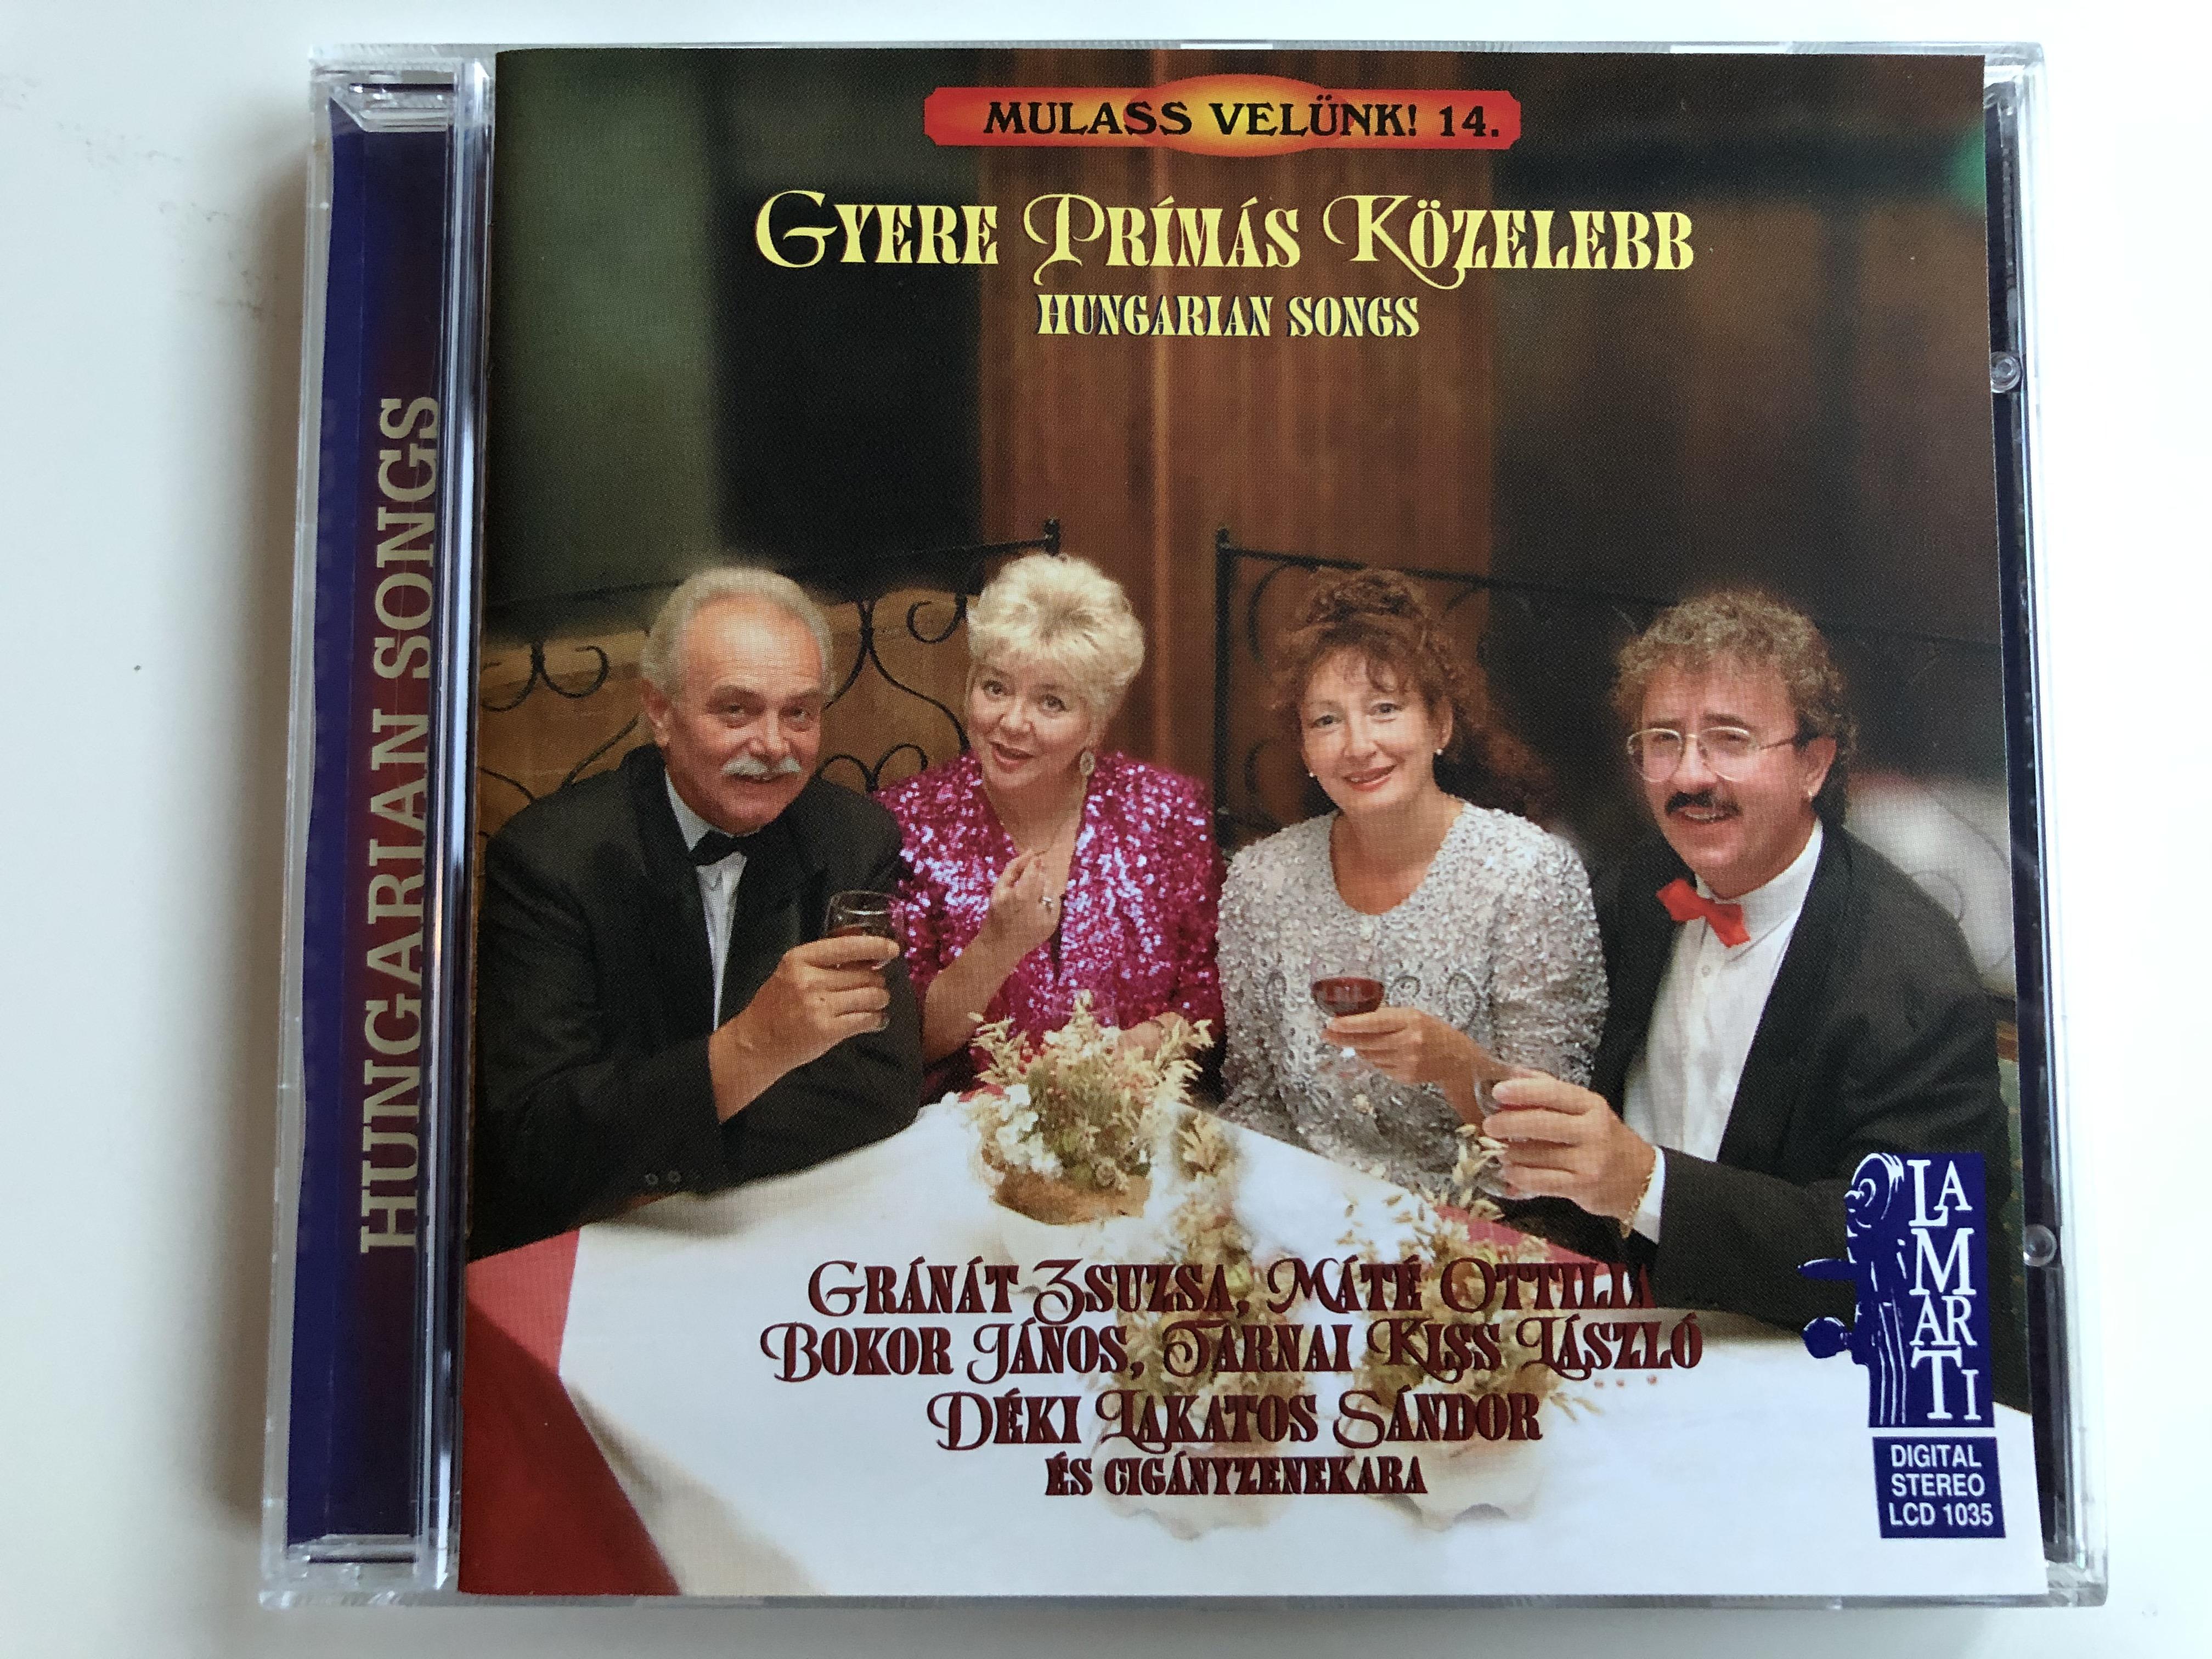 gyere-pr-m-s-k-zelebb-hungarian-songs-gr-n-t-zsuzsa-m-t-ott-lia-bokor-j-nos-tarnai-kiss-l-szl-d-ki-lakatos-s-ndor-es-ciganyzenekara-lamarti-audio-cd-2001-stereo-lcd-1035-1-.jpg